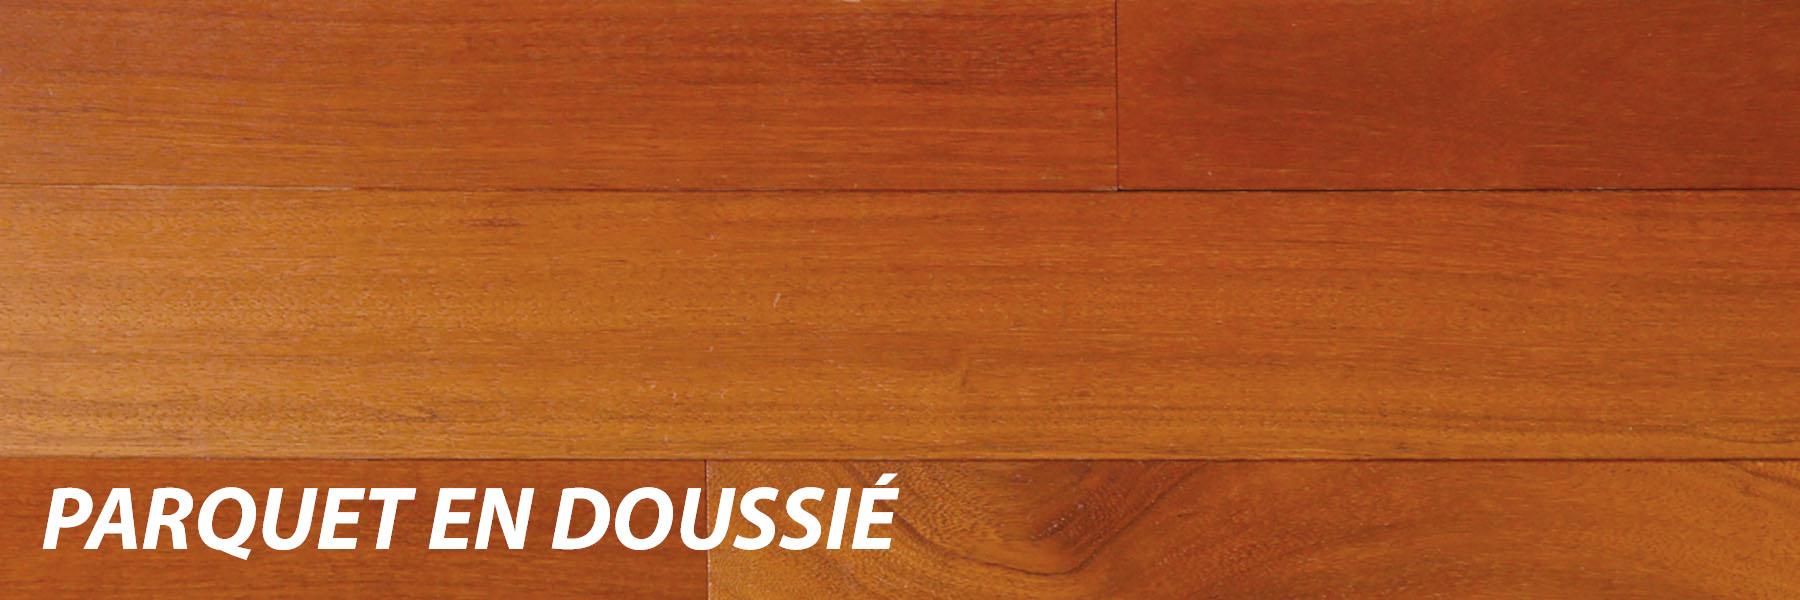 pose-parquet-doussie